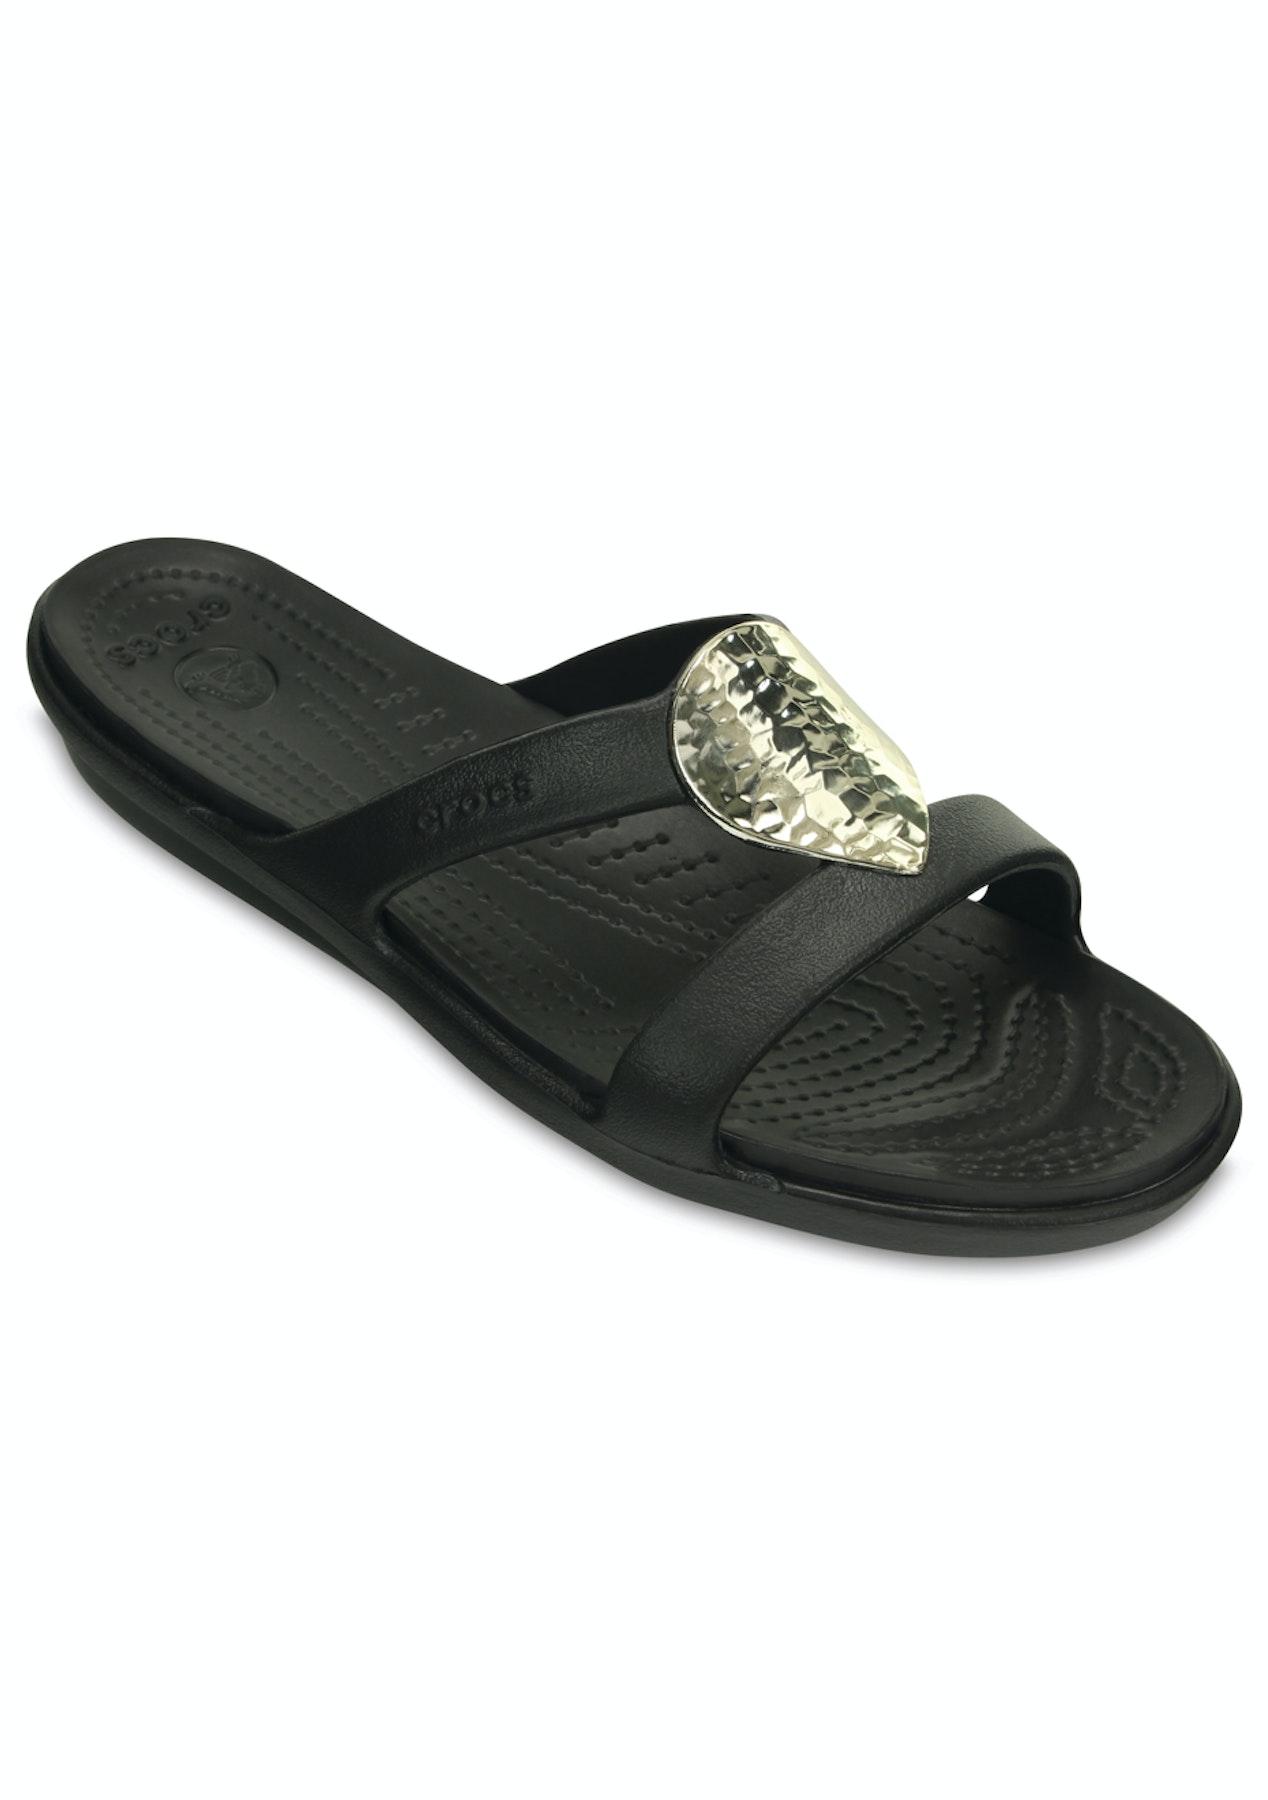 ab7e5dcf09a9 CROCS - Womens Sanrah Embellished Wedge Flip - Black Silver Metallic - Crocs  - Onceit